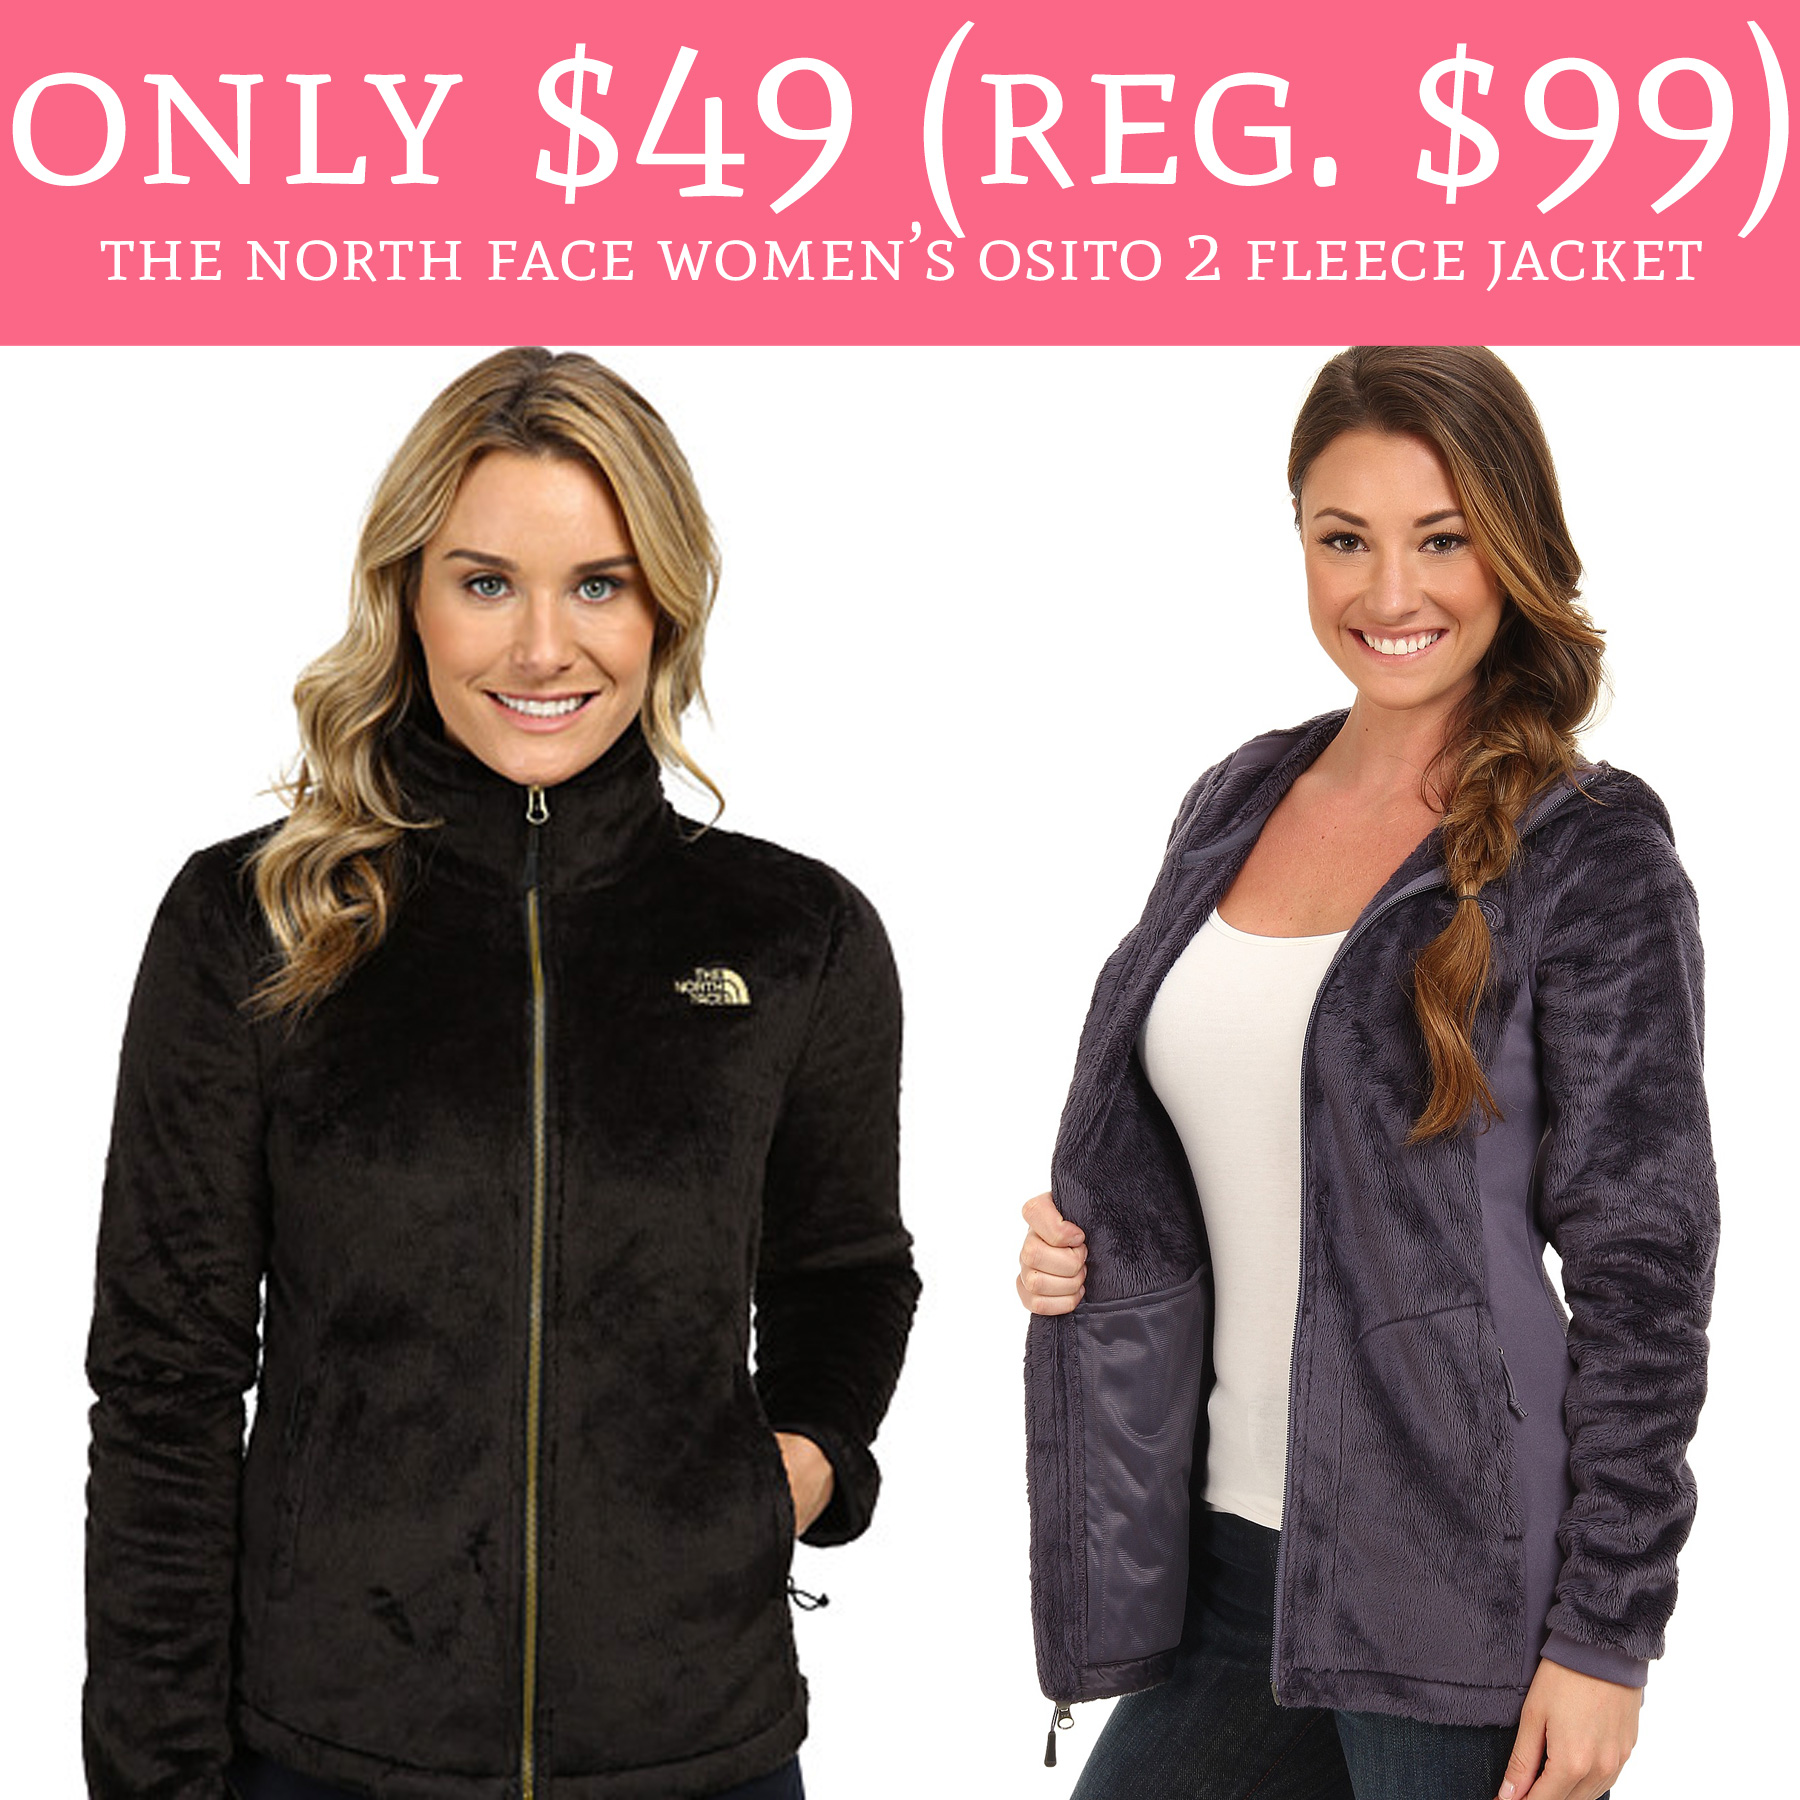 b6f0c41fb2 Only  49 (Regular  99) The North Face Women s Osito 2 Fleece Jacket ...